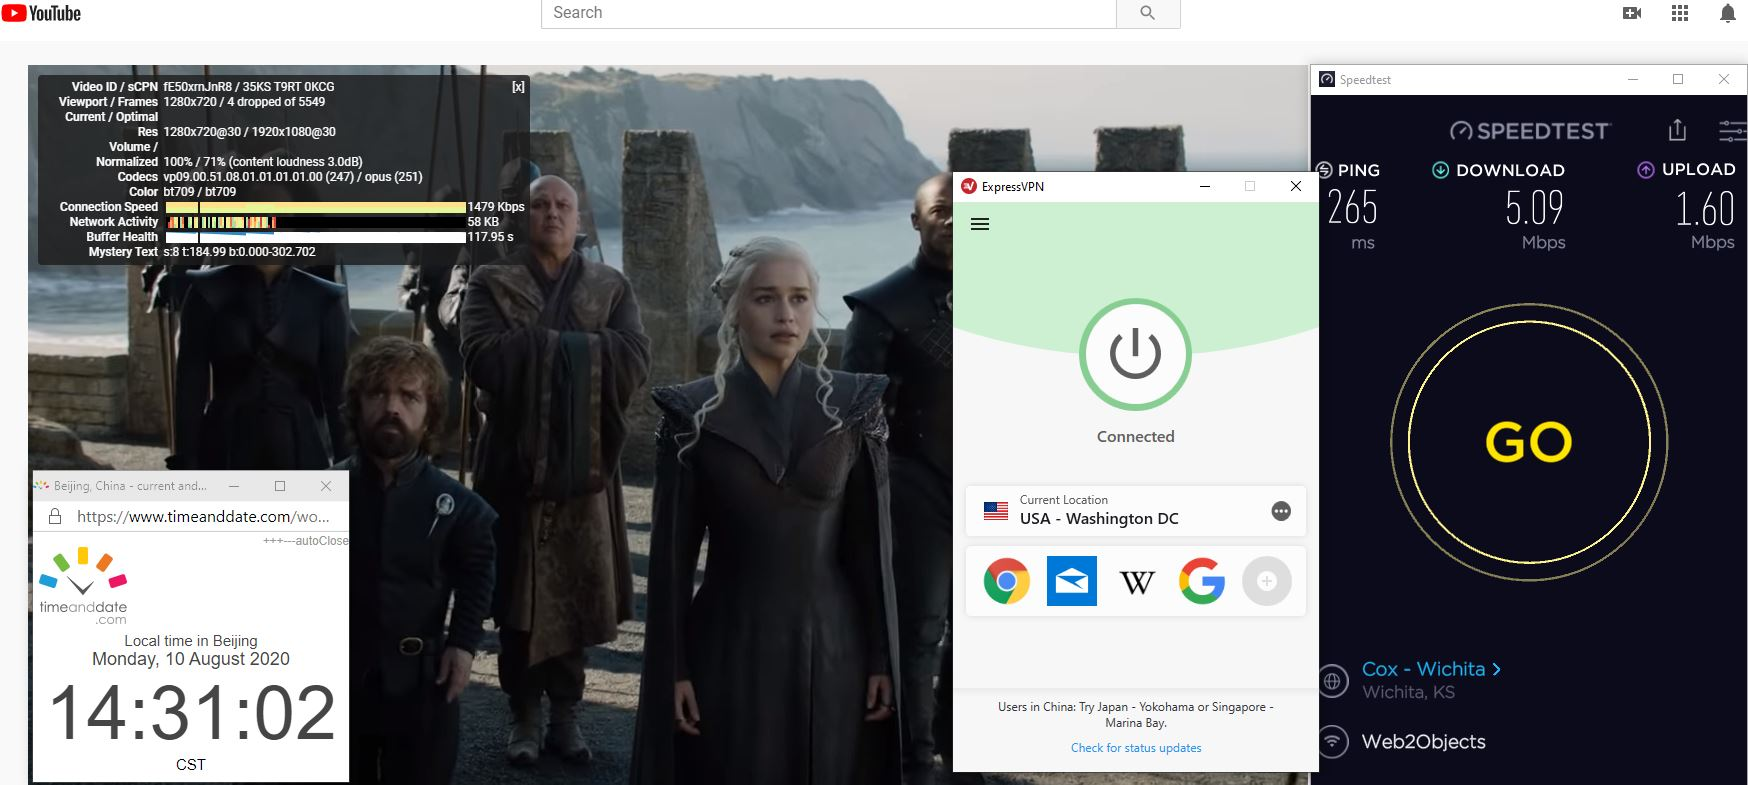 Windows10 ExpressVPN IKEv2协议 USA - Waington DC 中国VPN 翻墙 科学上网 翻墙速度测试 - 20200810